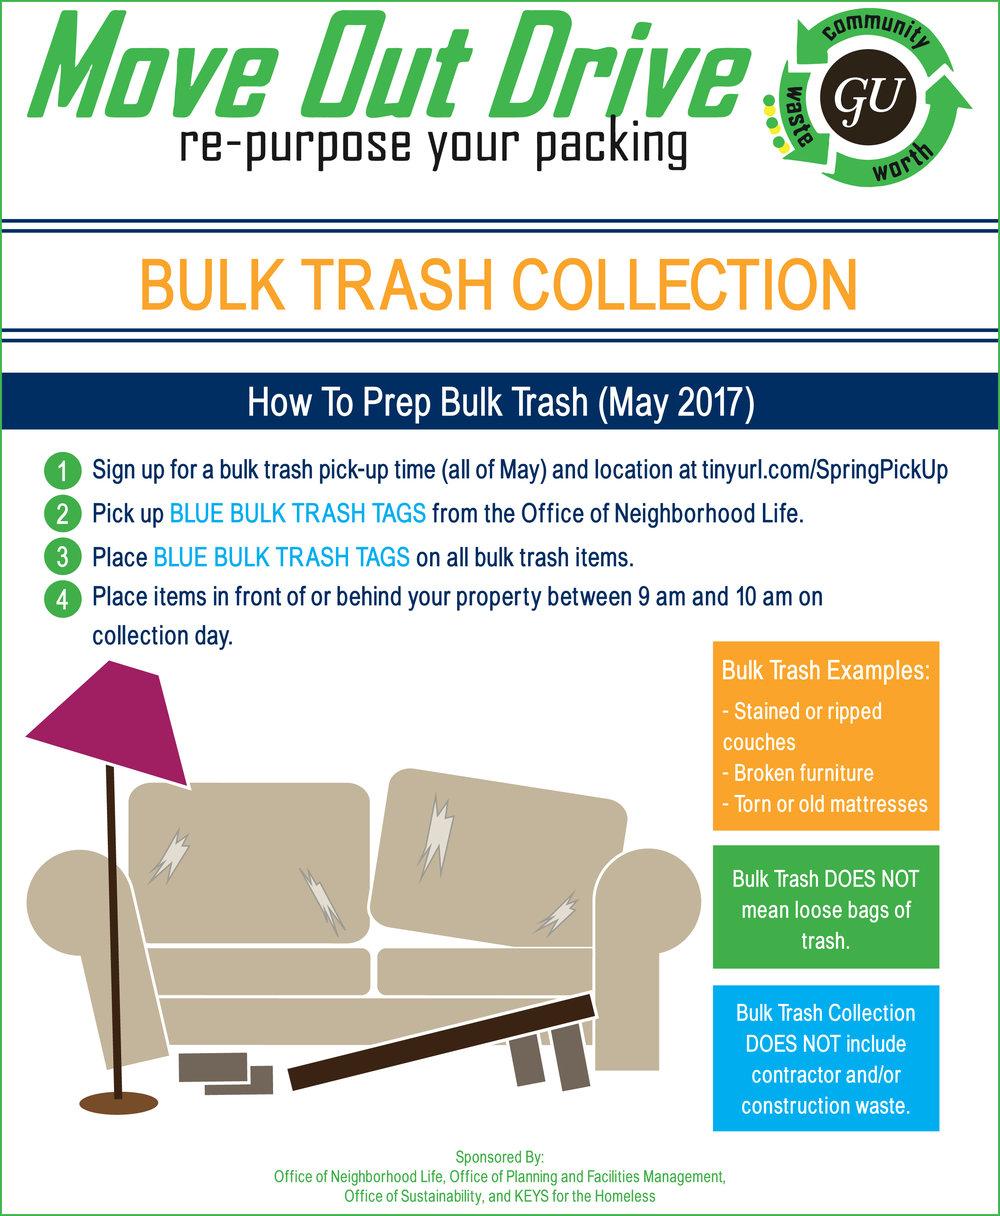 2017.05-GU-Drive-Bulk-Trash.jpg